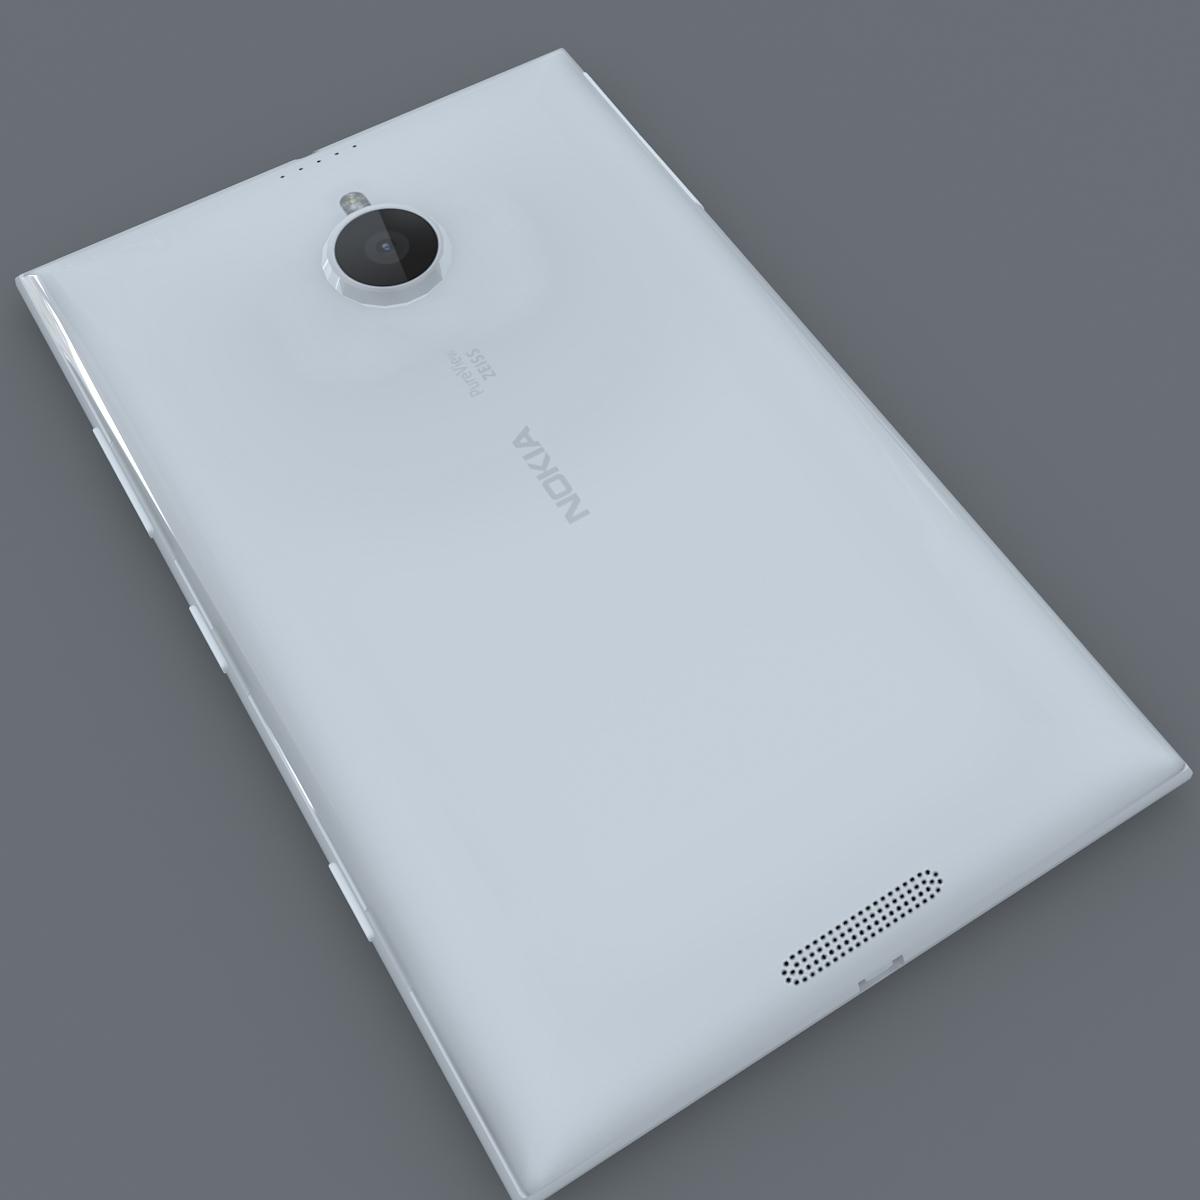 nokia lumia 1520 white 3d model max fbx c4d lxo ma mb obj 158424